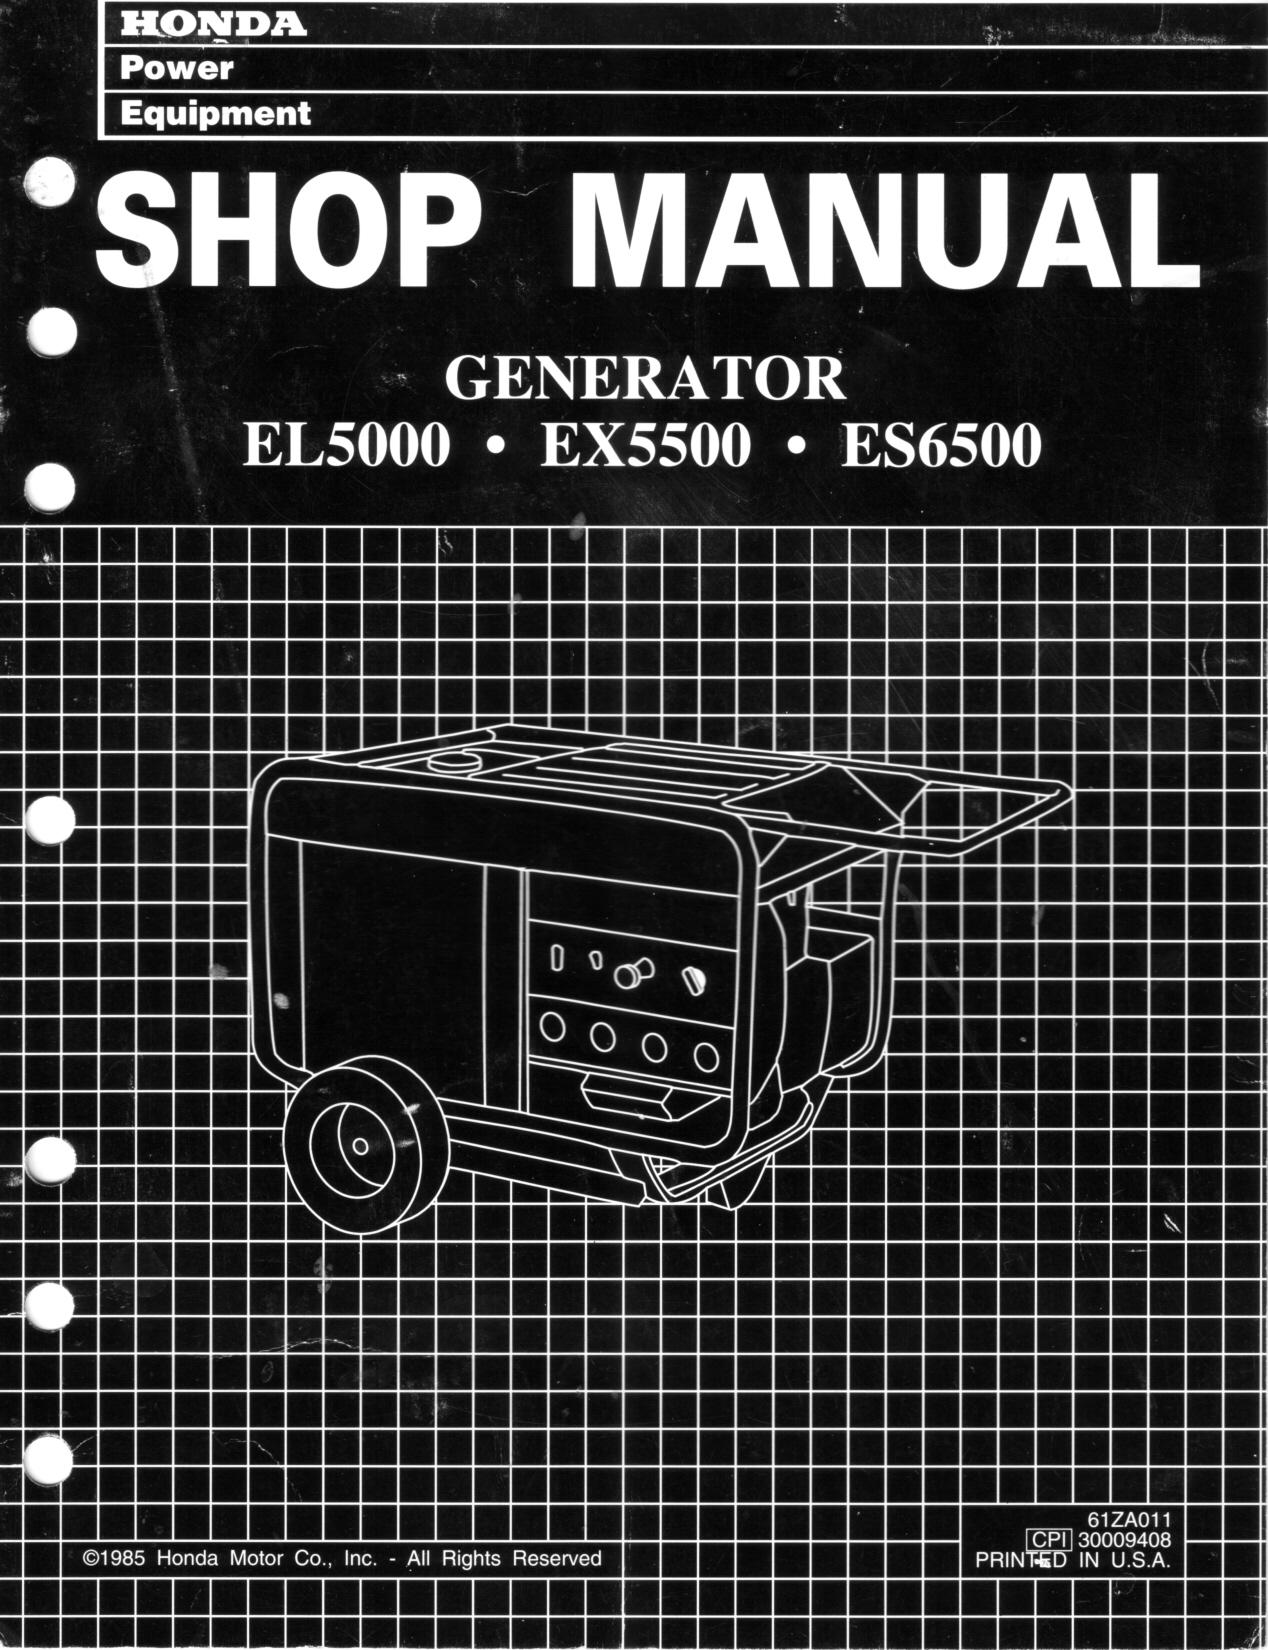 honda ex5500 wiring diagram br 3404  honda ex5500 wiring diagram  br 3404  honda ex5500 wiring diagram